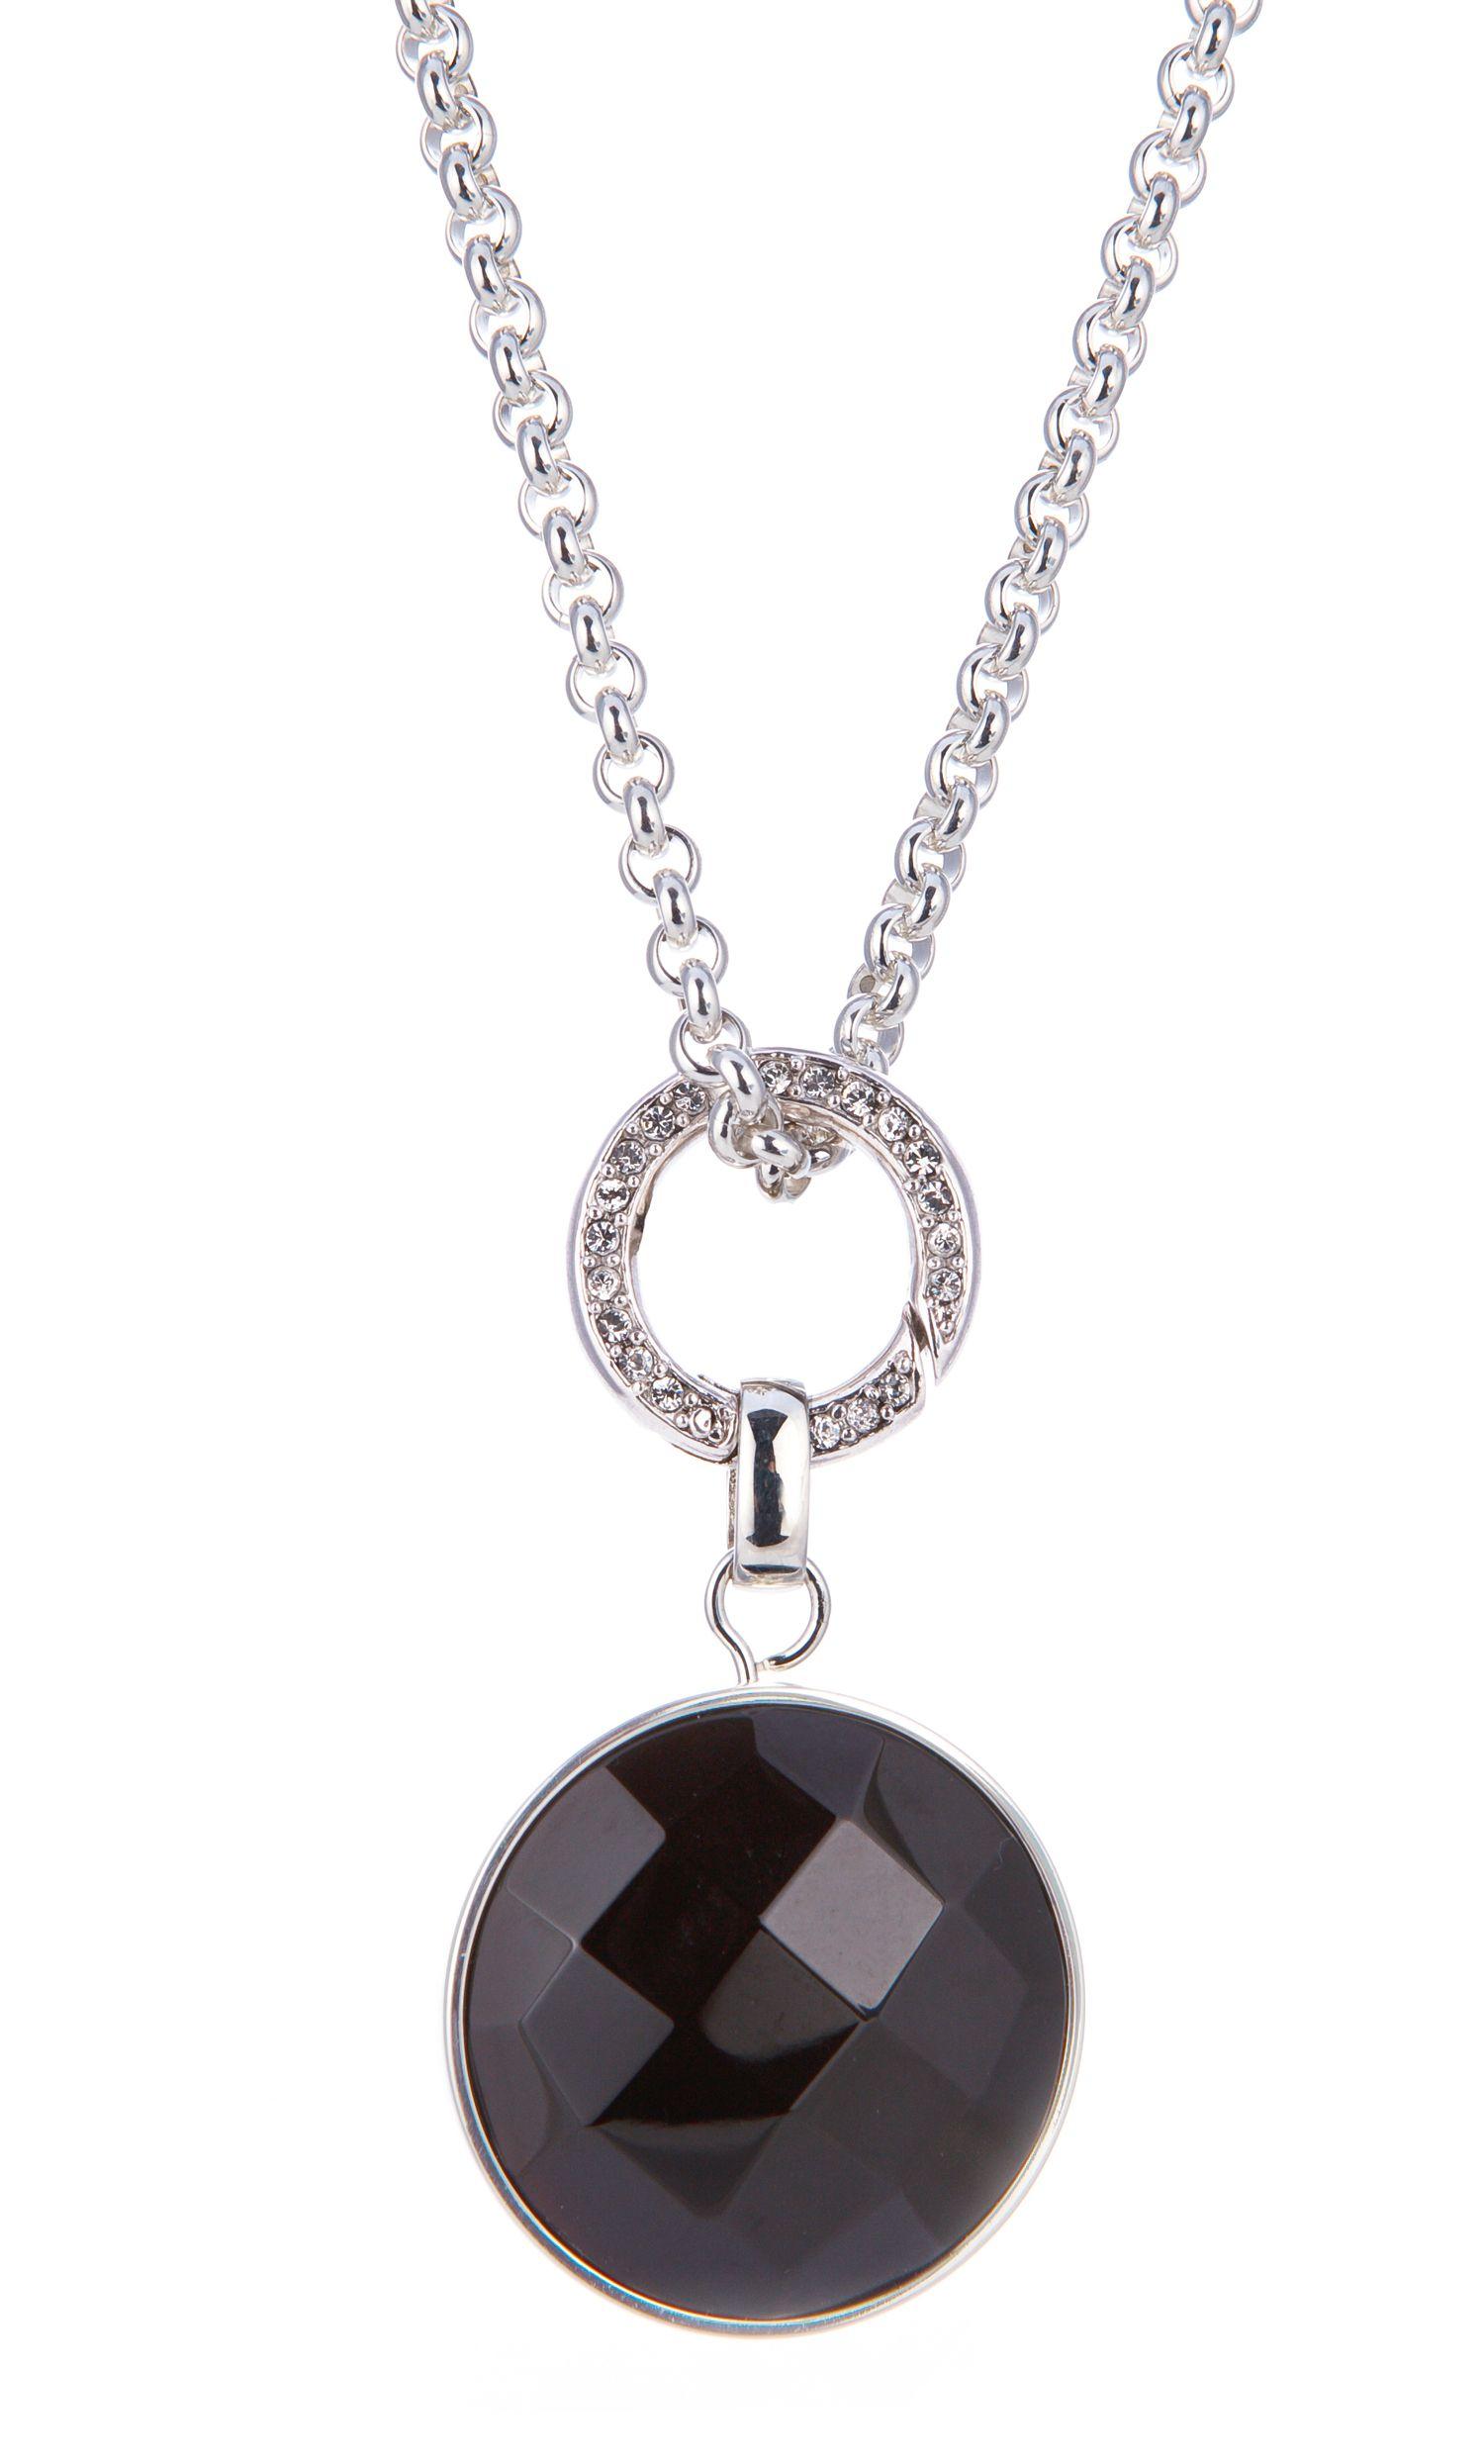 Kagi Jewellery Eclipse Jewelry Box Pinterest Male jewelry